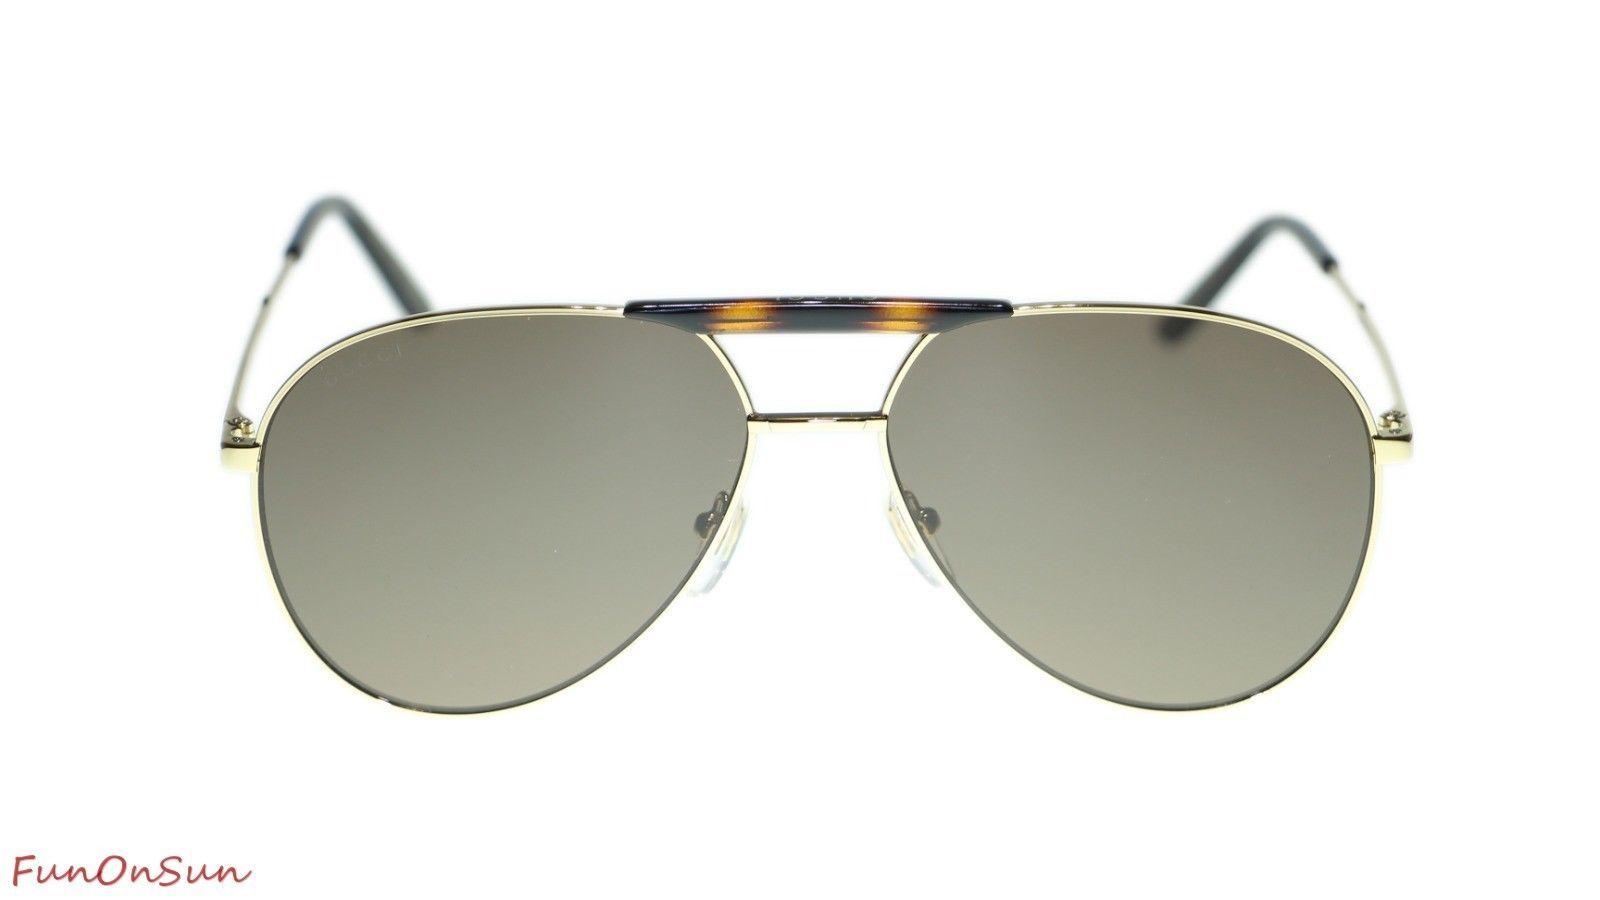 46529f05cf401 Gucci Men Sunglasses GG0242S 002 Gold Brown Lens Aviator 59mm Authentic